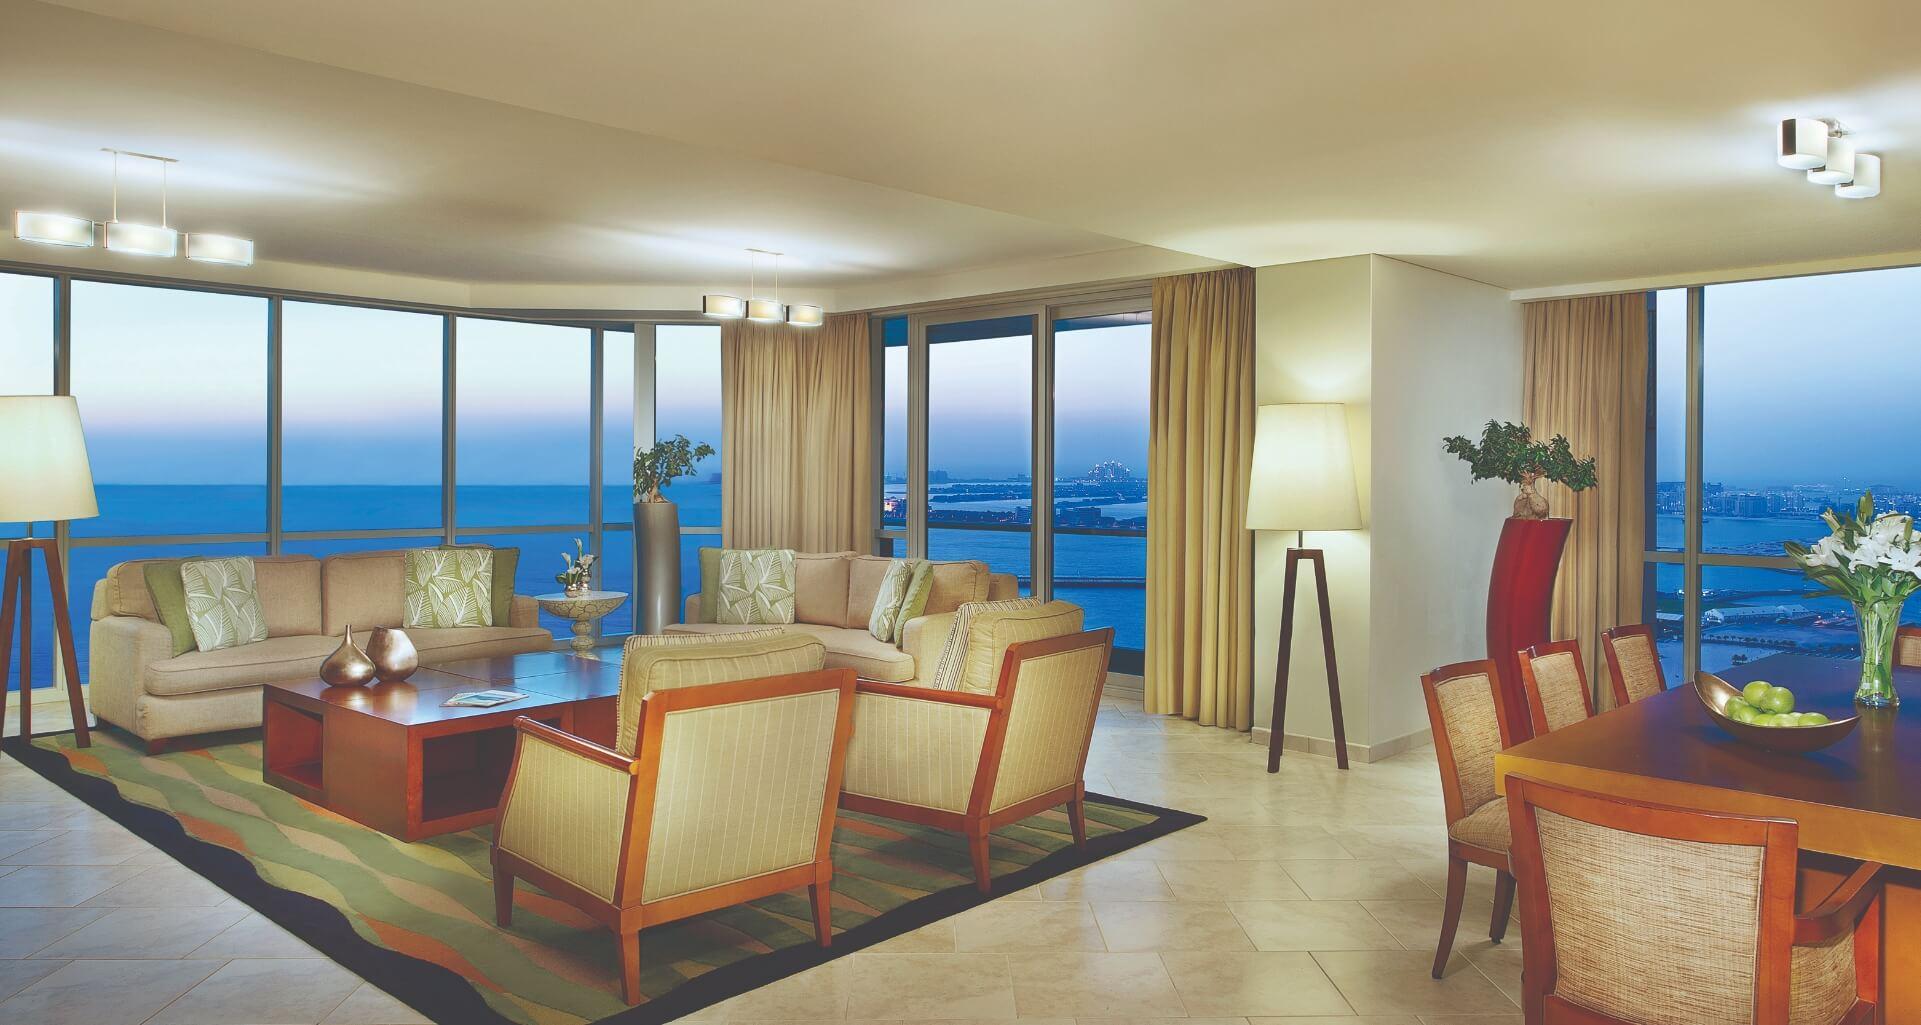 JA Oasis Beach Tower - 4 bedroom - Living Room.jpg